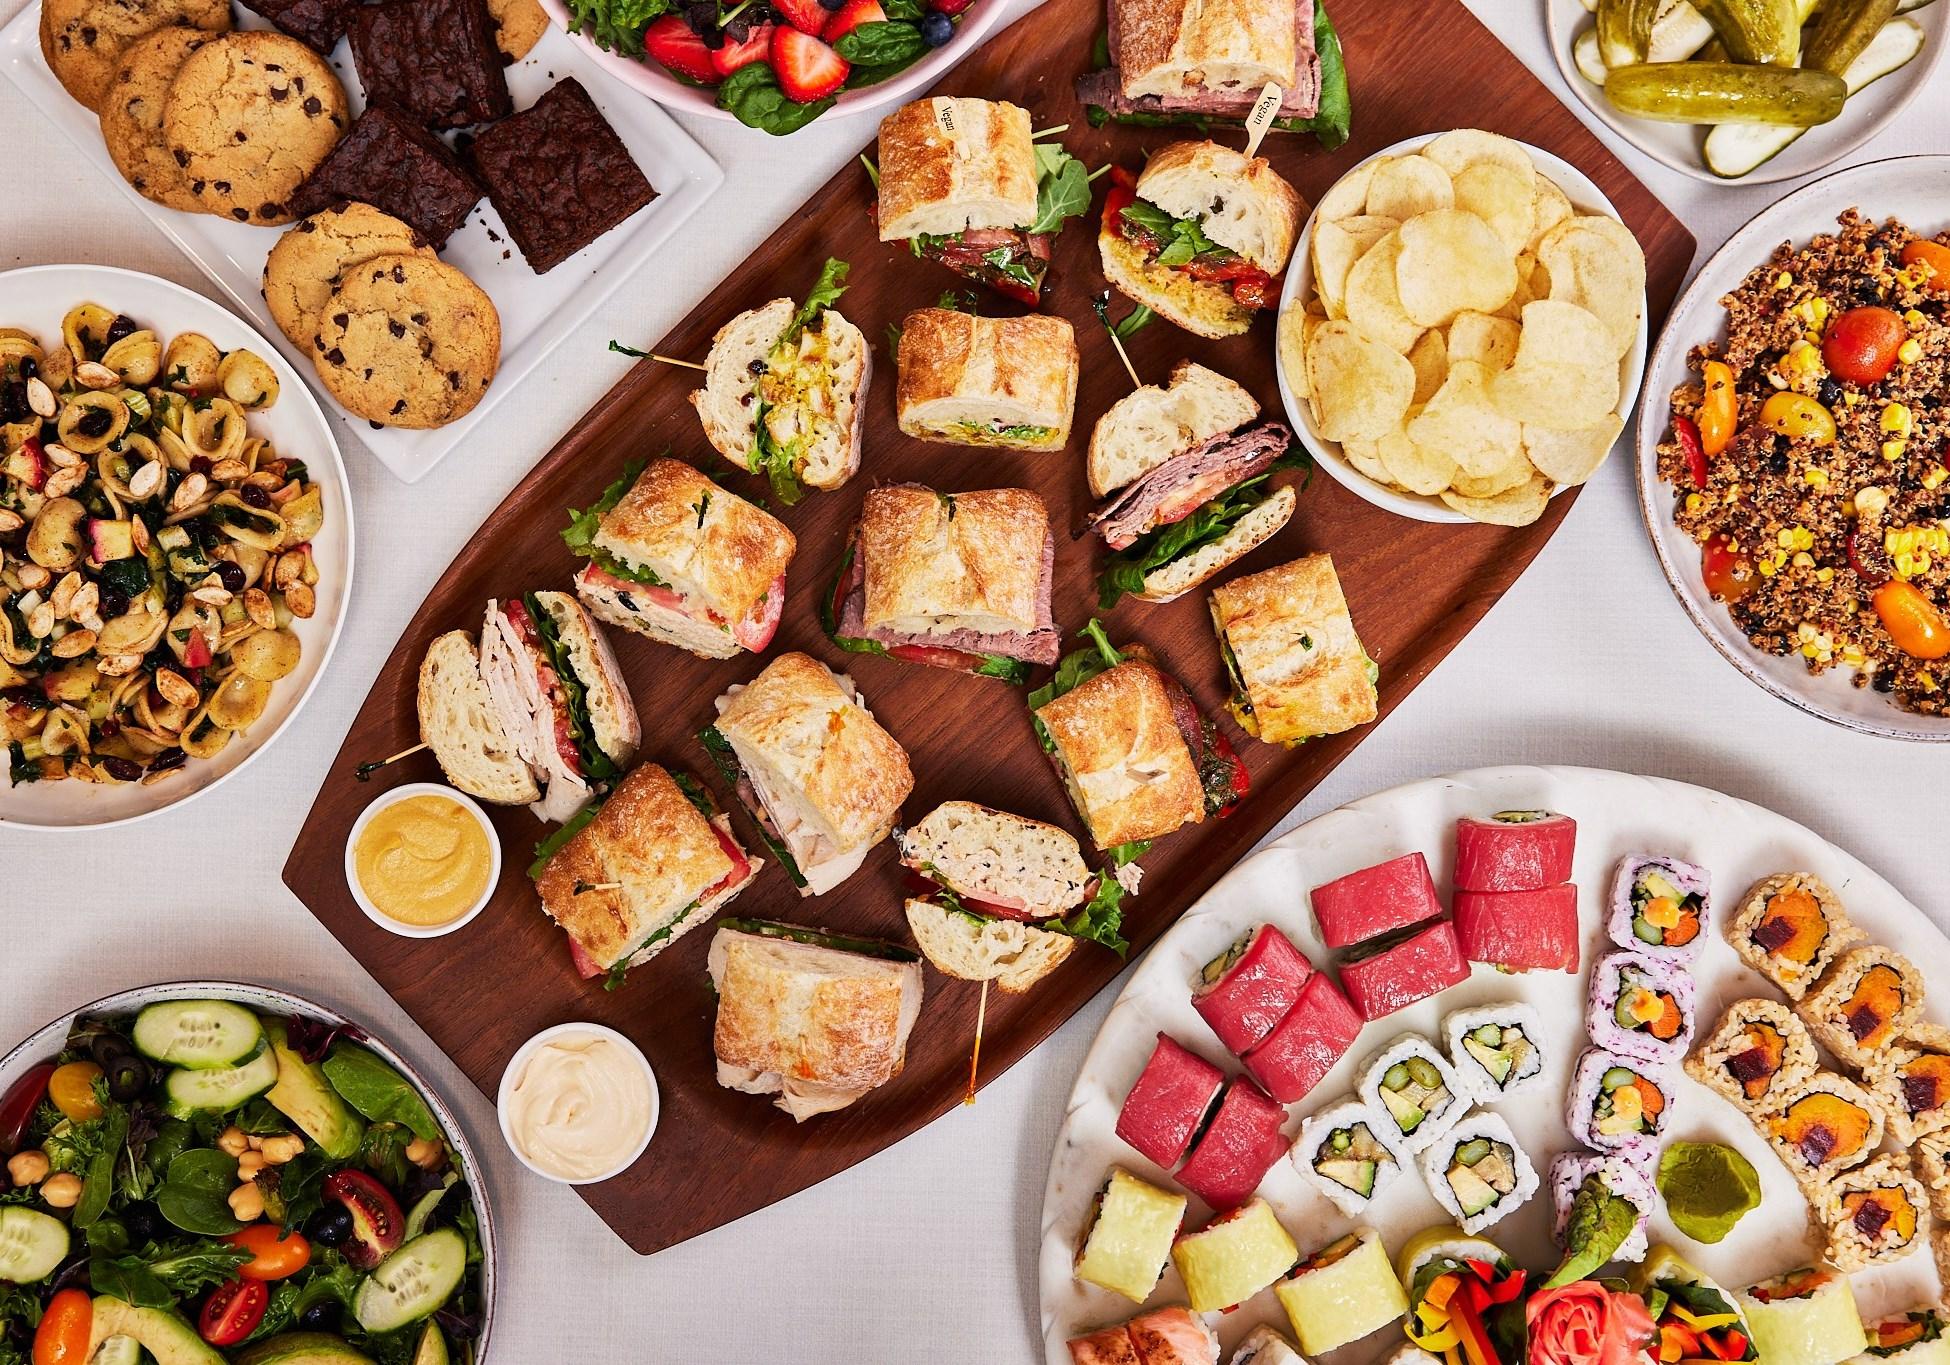 Boston Common Sushi & Sandwich Package - Signature Medium